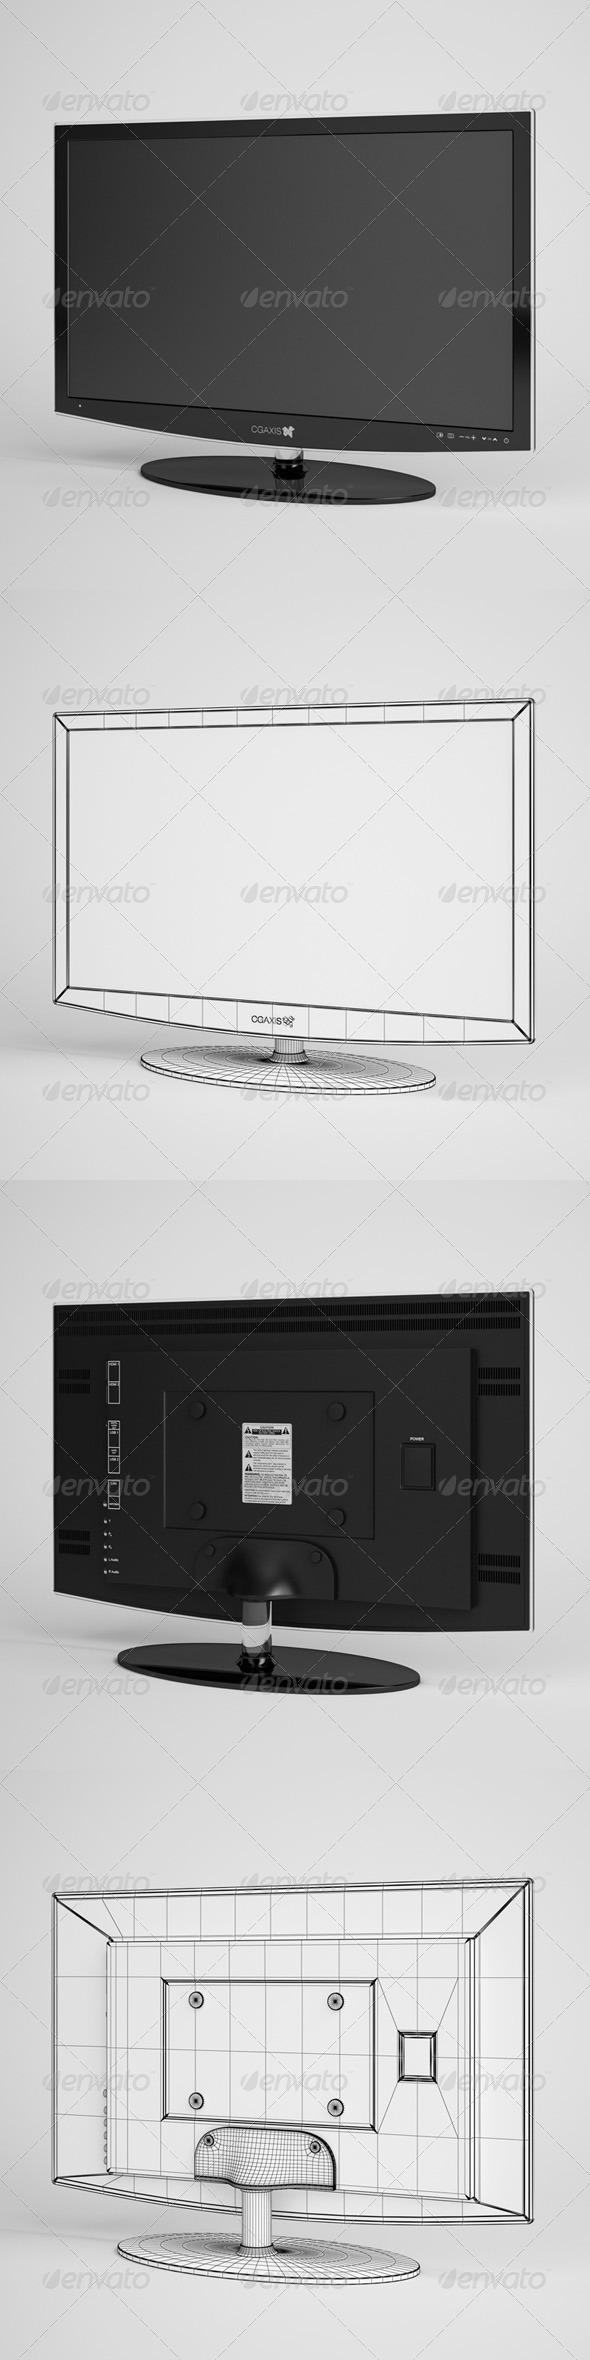 CGAxis TV Flatscreen Electronics 04 - 3DOcean Item for Sale